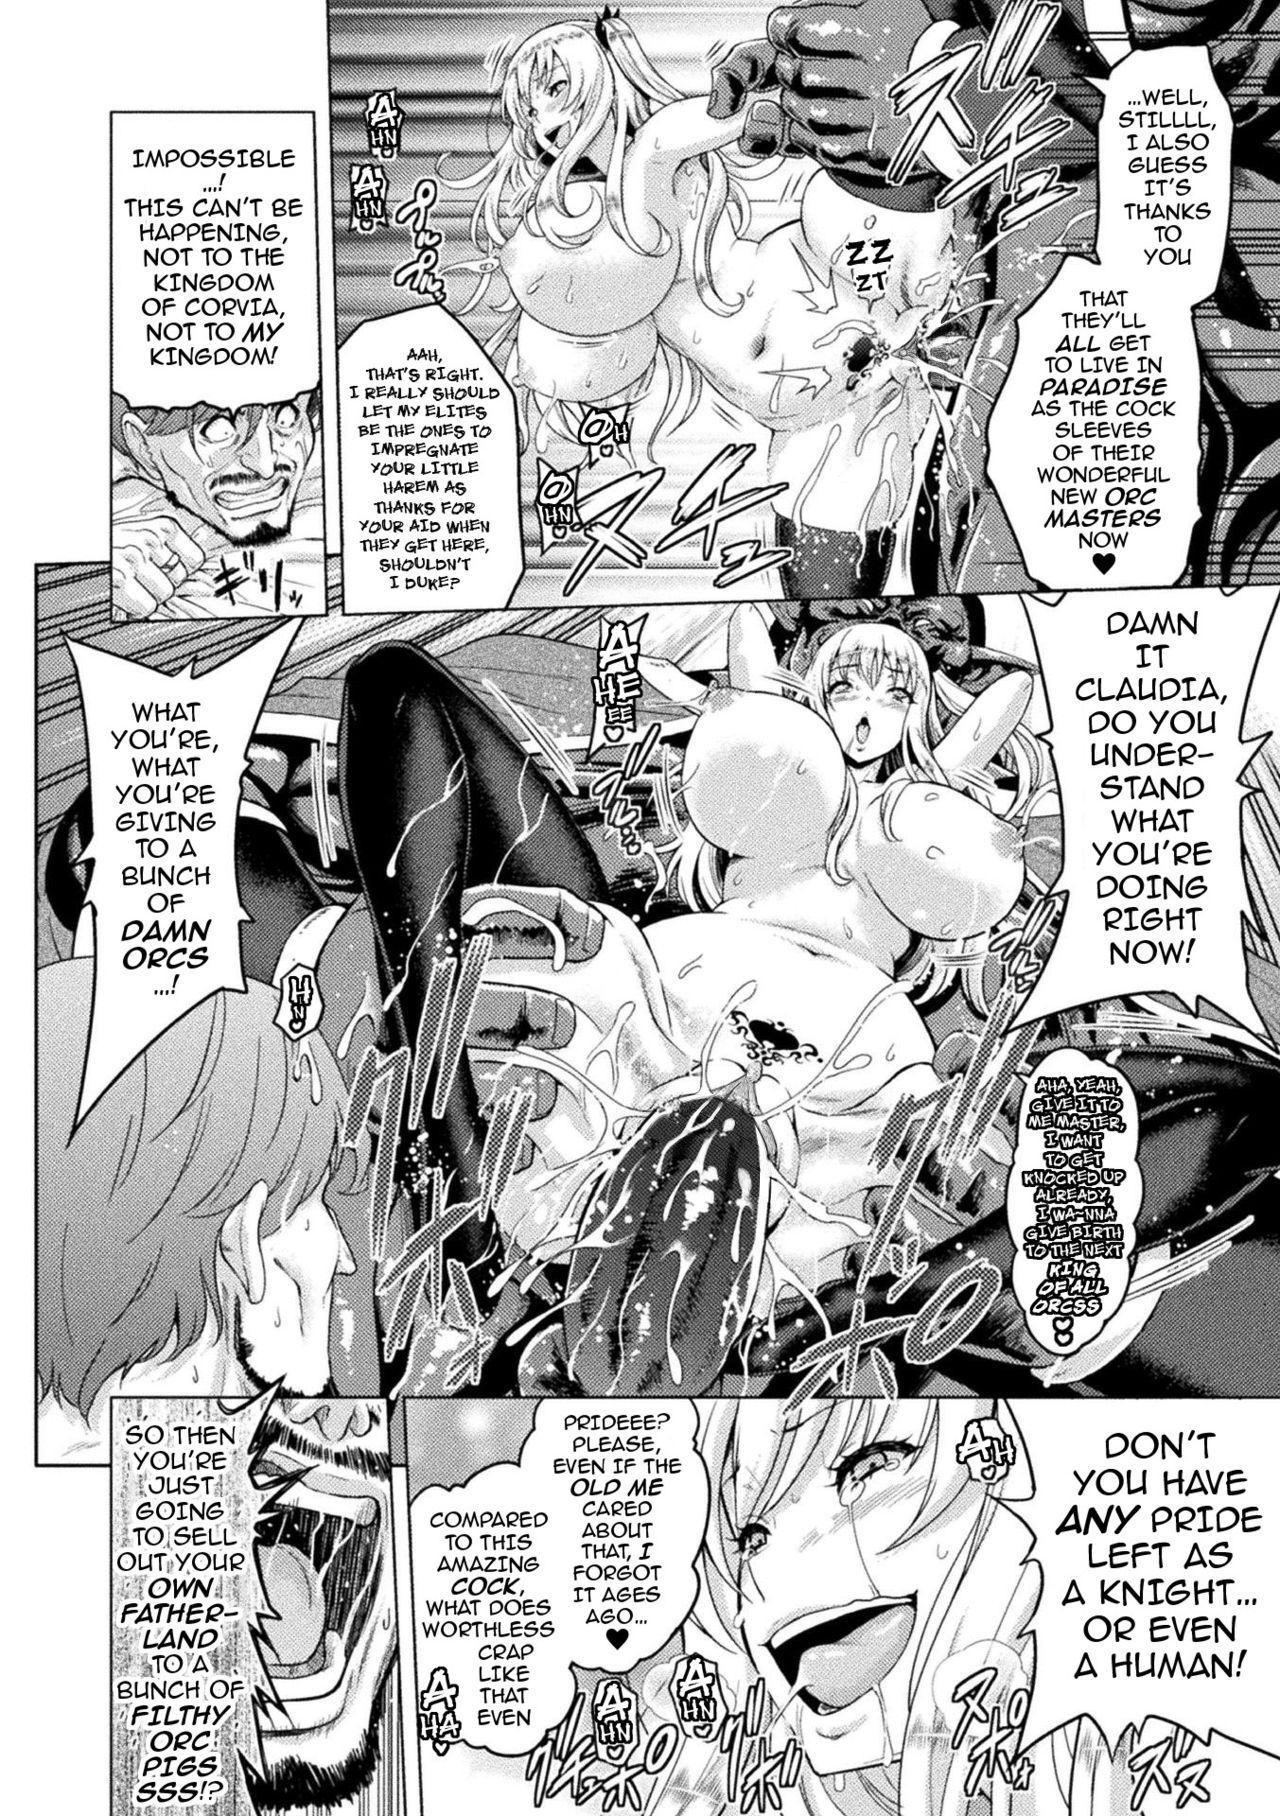 [Yamada Gogogo] Erona ~Orc no Inmon ni Okasareta Onna Kishi no Matsuro~ | Erona ~The Fall of a Beautiful Knight Cursed with the Lewd Mark of an Orc~ Ch. 1-6 [English] [darknight] [Decensored] [ongoing] 97